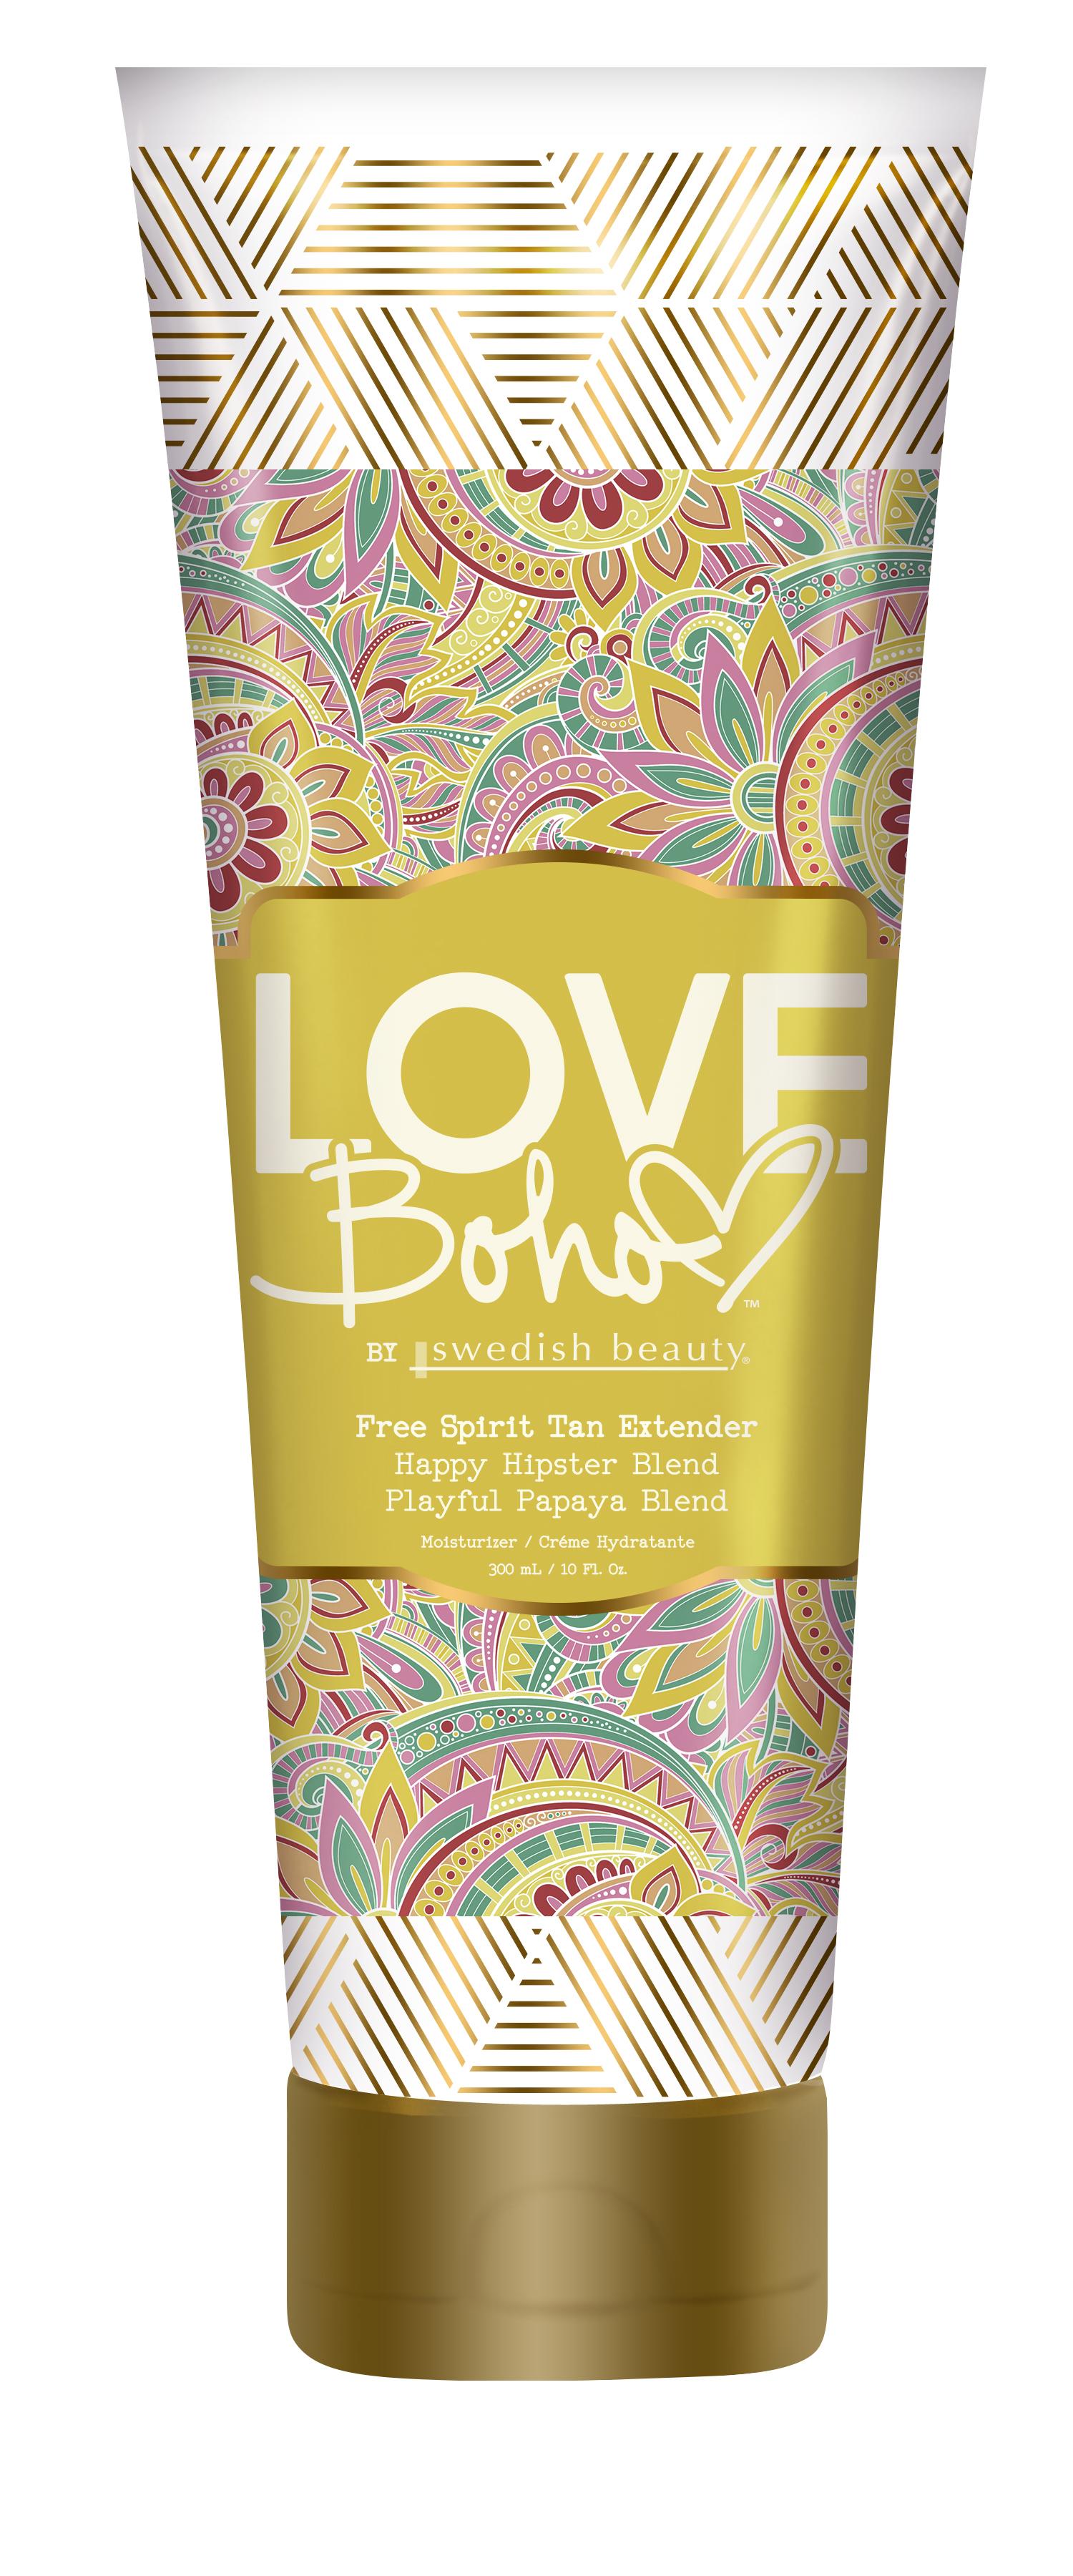 Love Boho™ Tan Extender